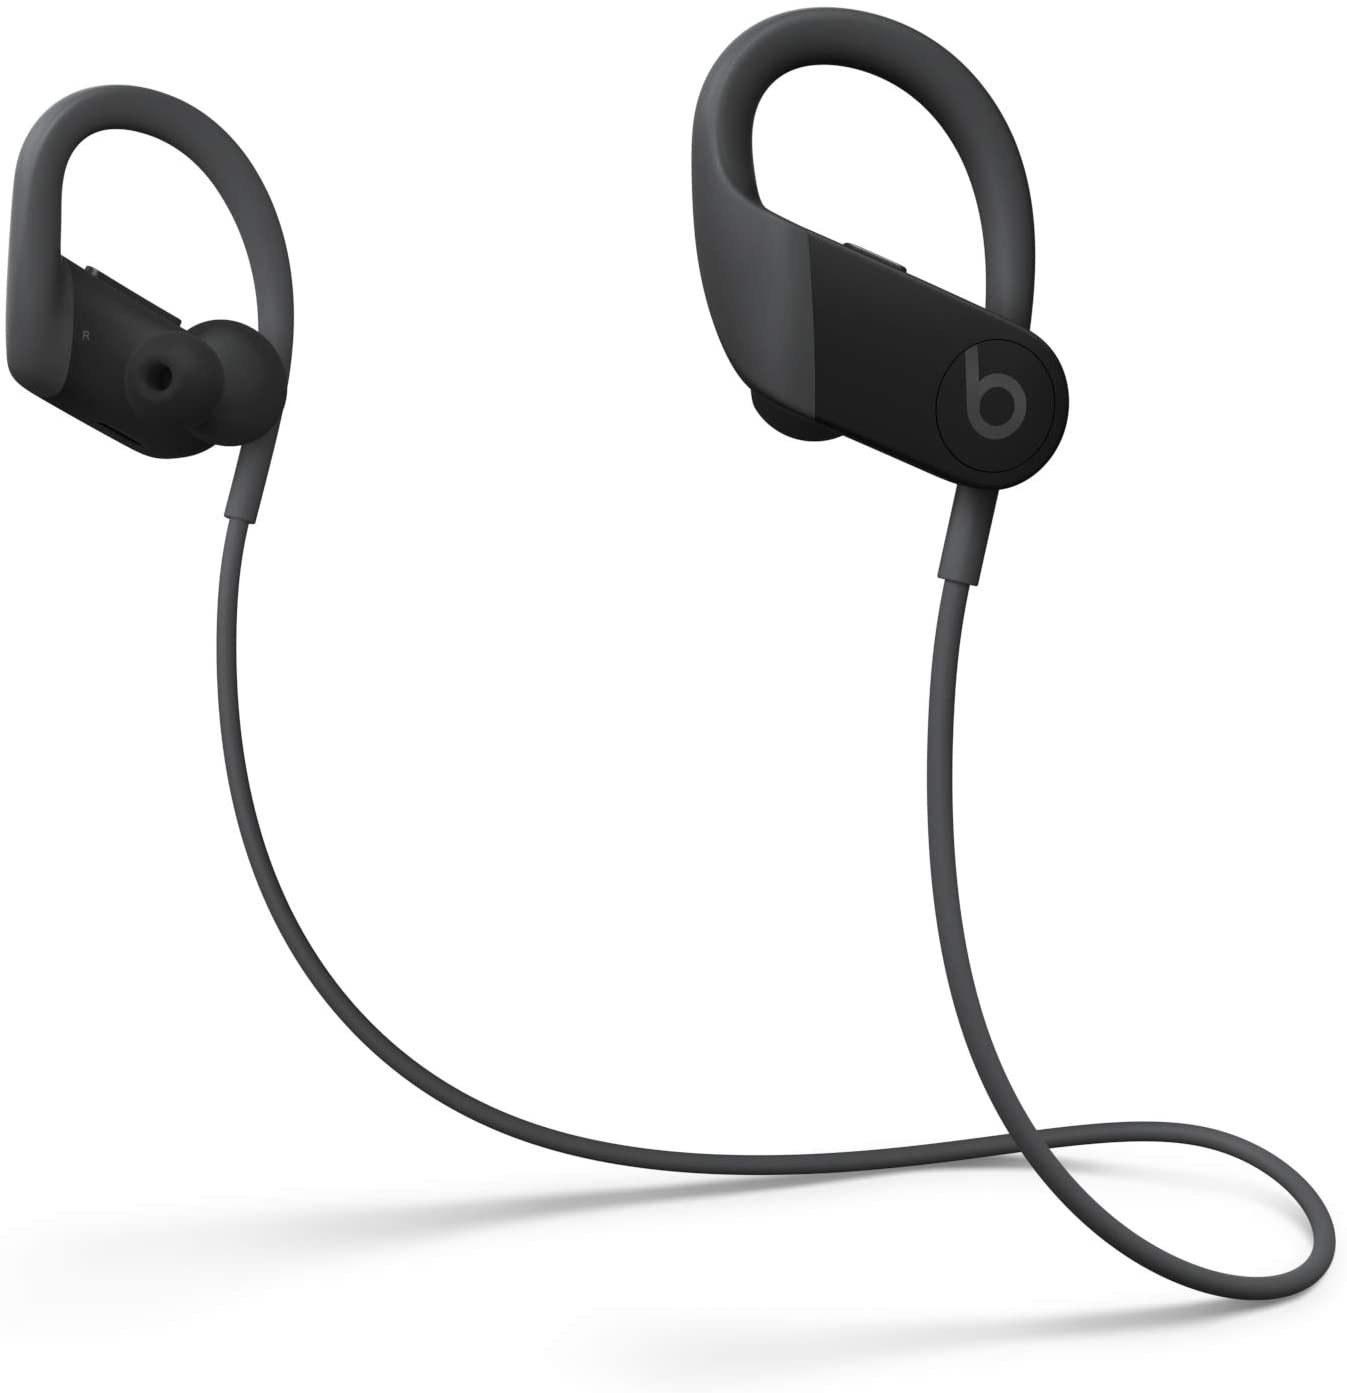 عکس هدفون بی سیم مدل Powerbeats Powerbeats High-Performance Wireless Earphones - Apple H1 Headphone Chip, Class 1 Bluetooth, 15 Hours Of Listening Time, Sweat Resistant Earbuds - Black (Latest Model) هدفون-بی-سیم-مدل-powerbeats